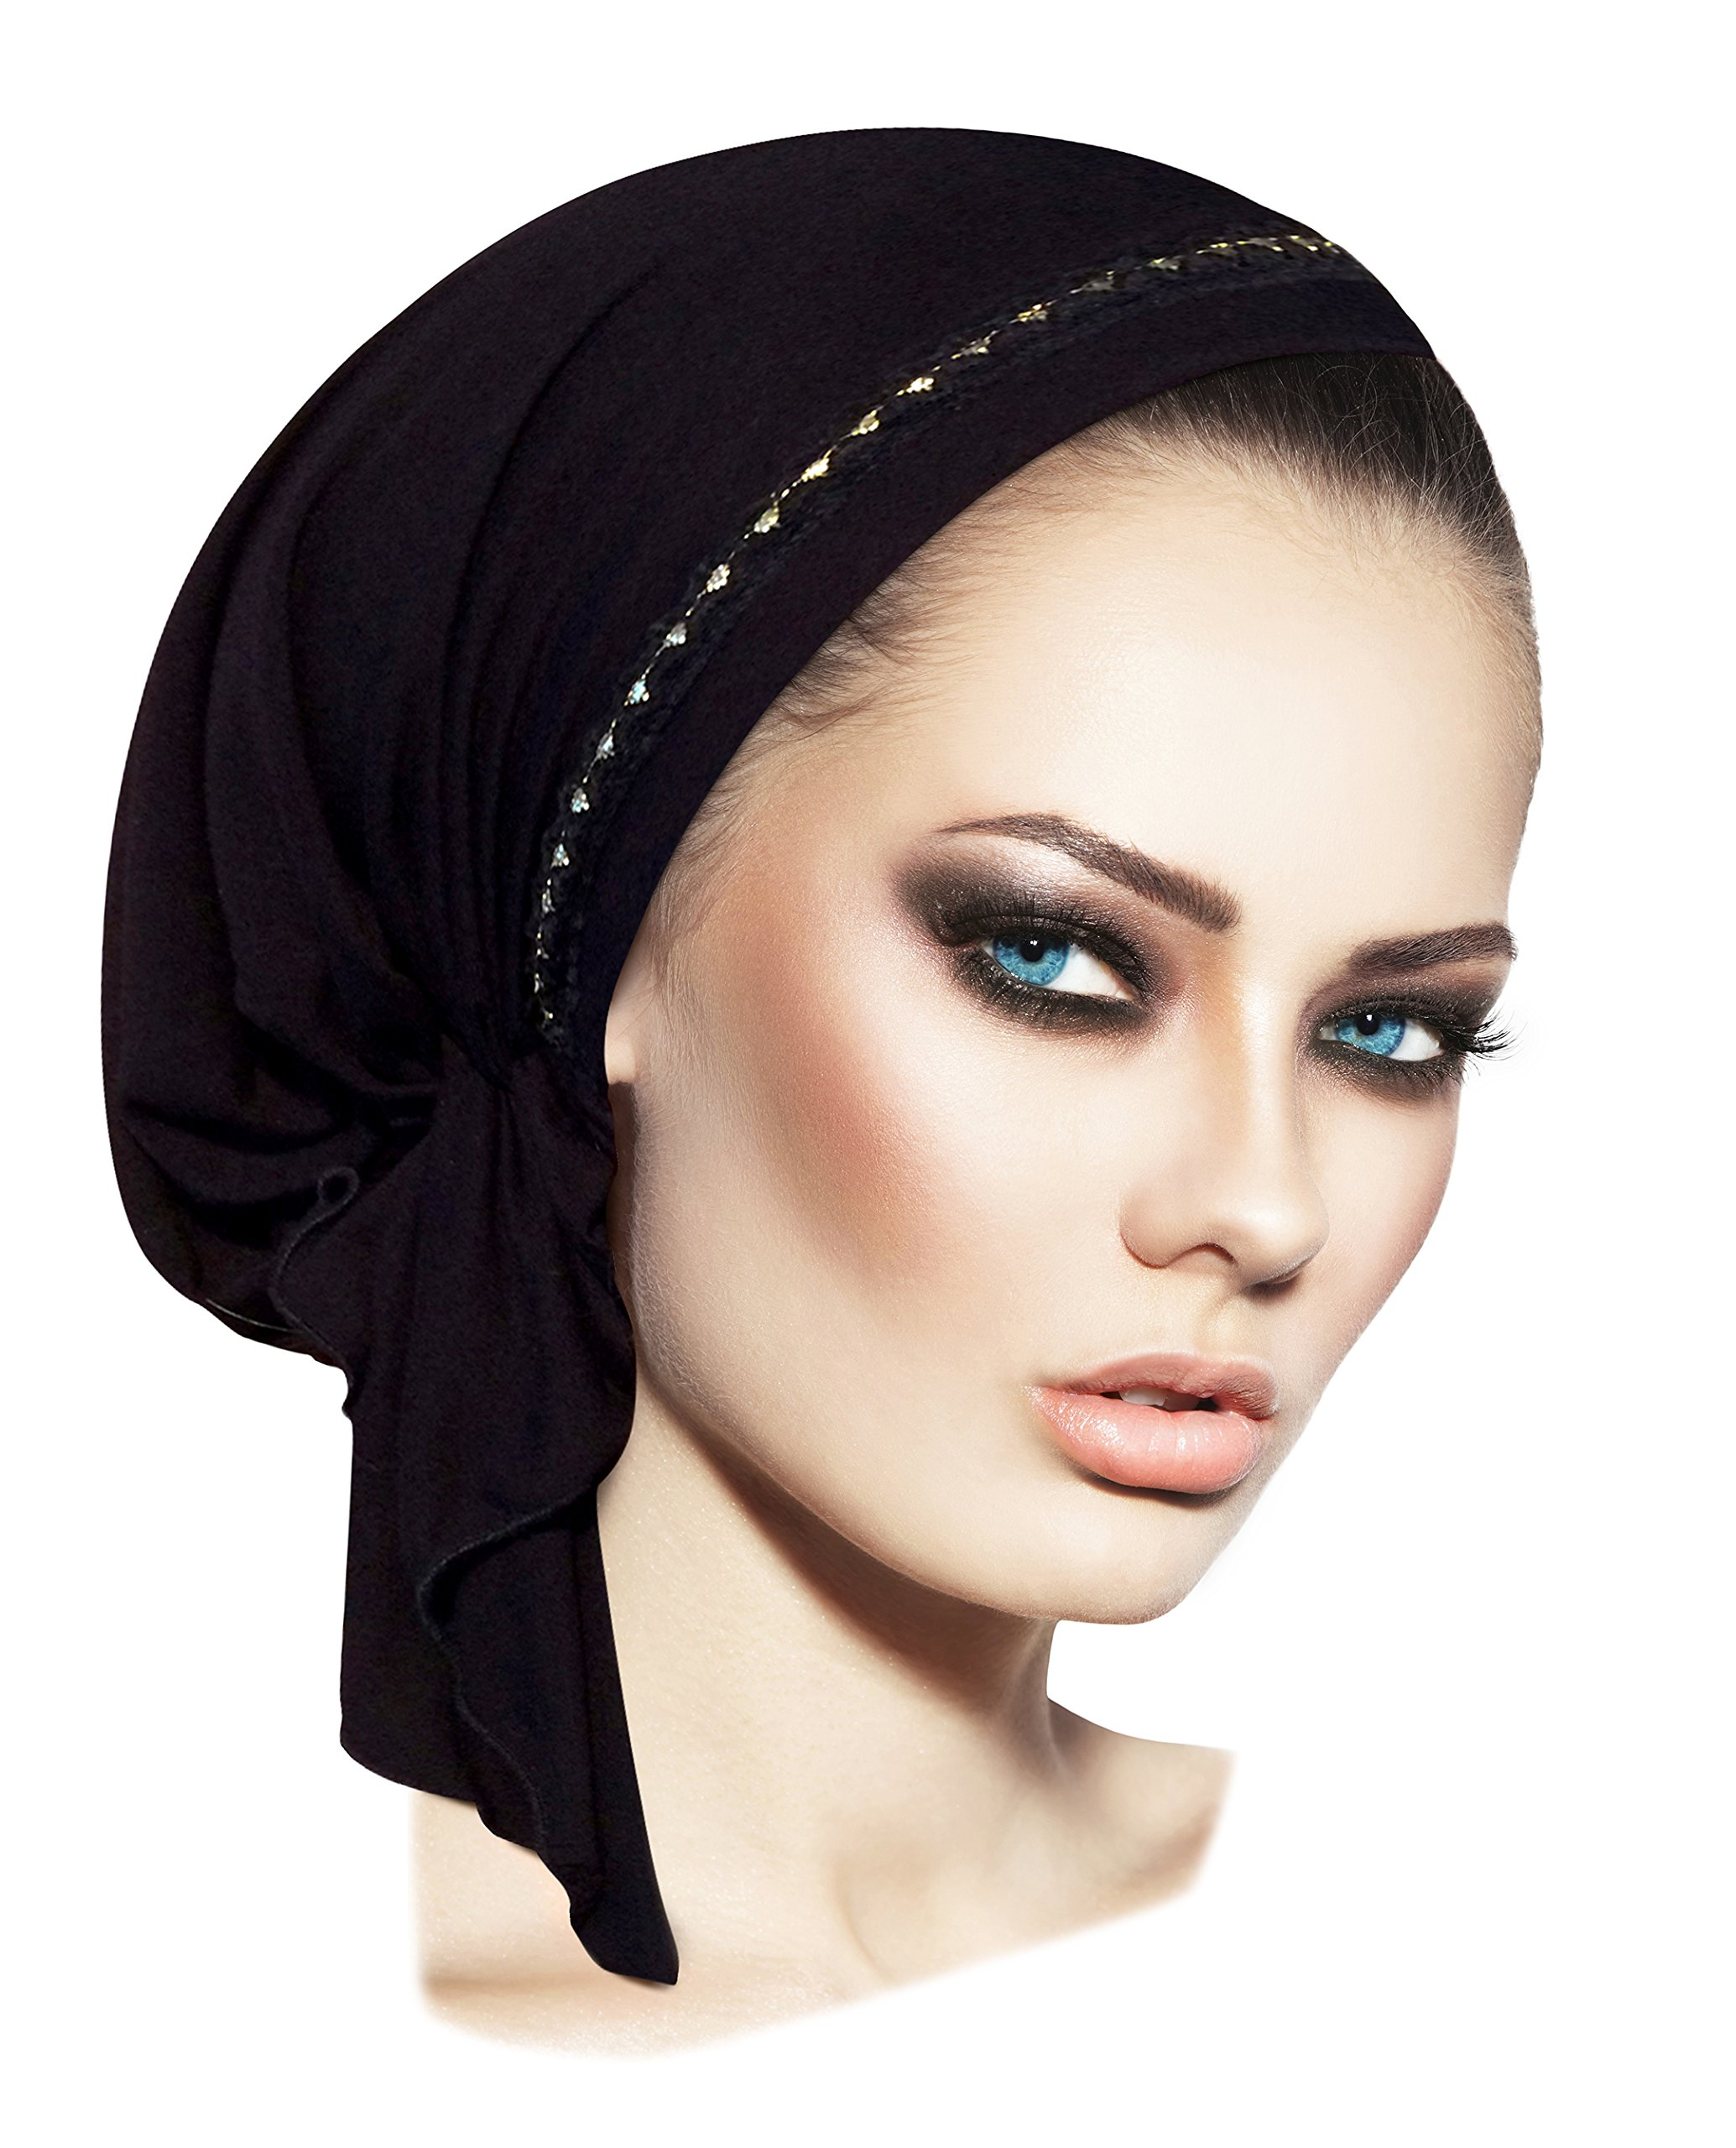 ShariRose Black Tichel Headscarf Black Gold Lace (Black Gold Lace - 326)